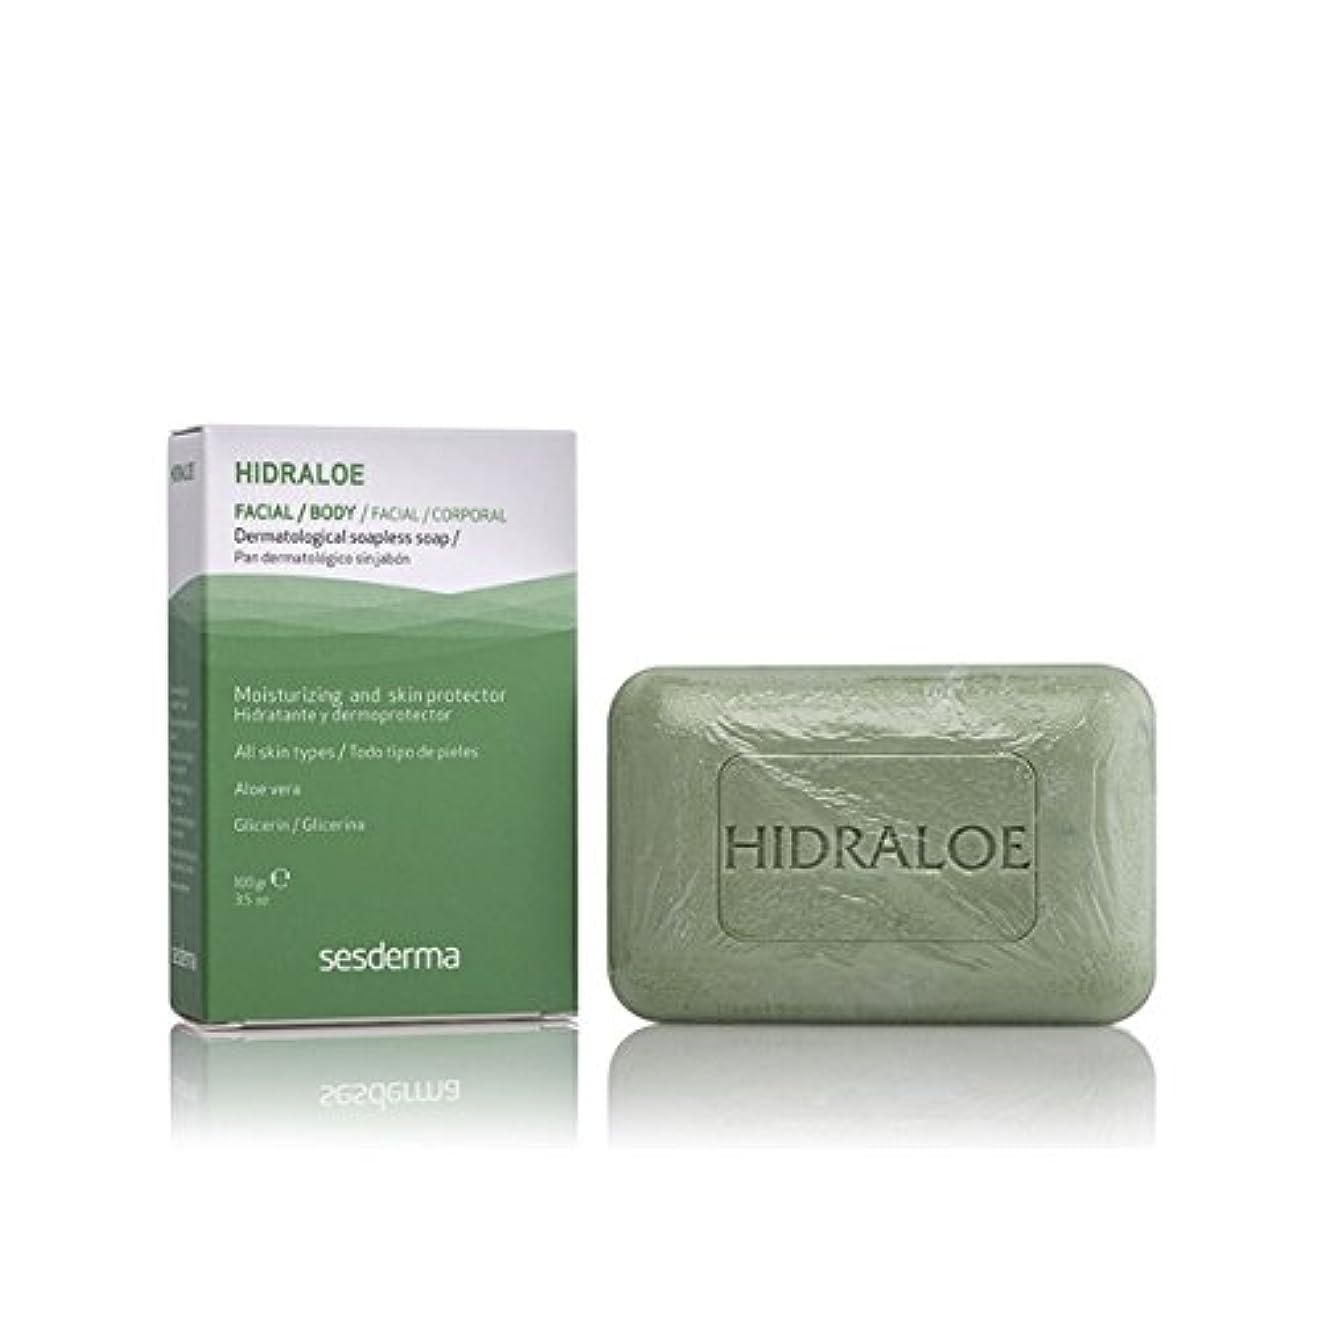 混乱受取人森林Sesderma Hidraloe Dermatological Soapless Soap 100gr [並行輸入品]